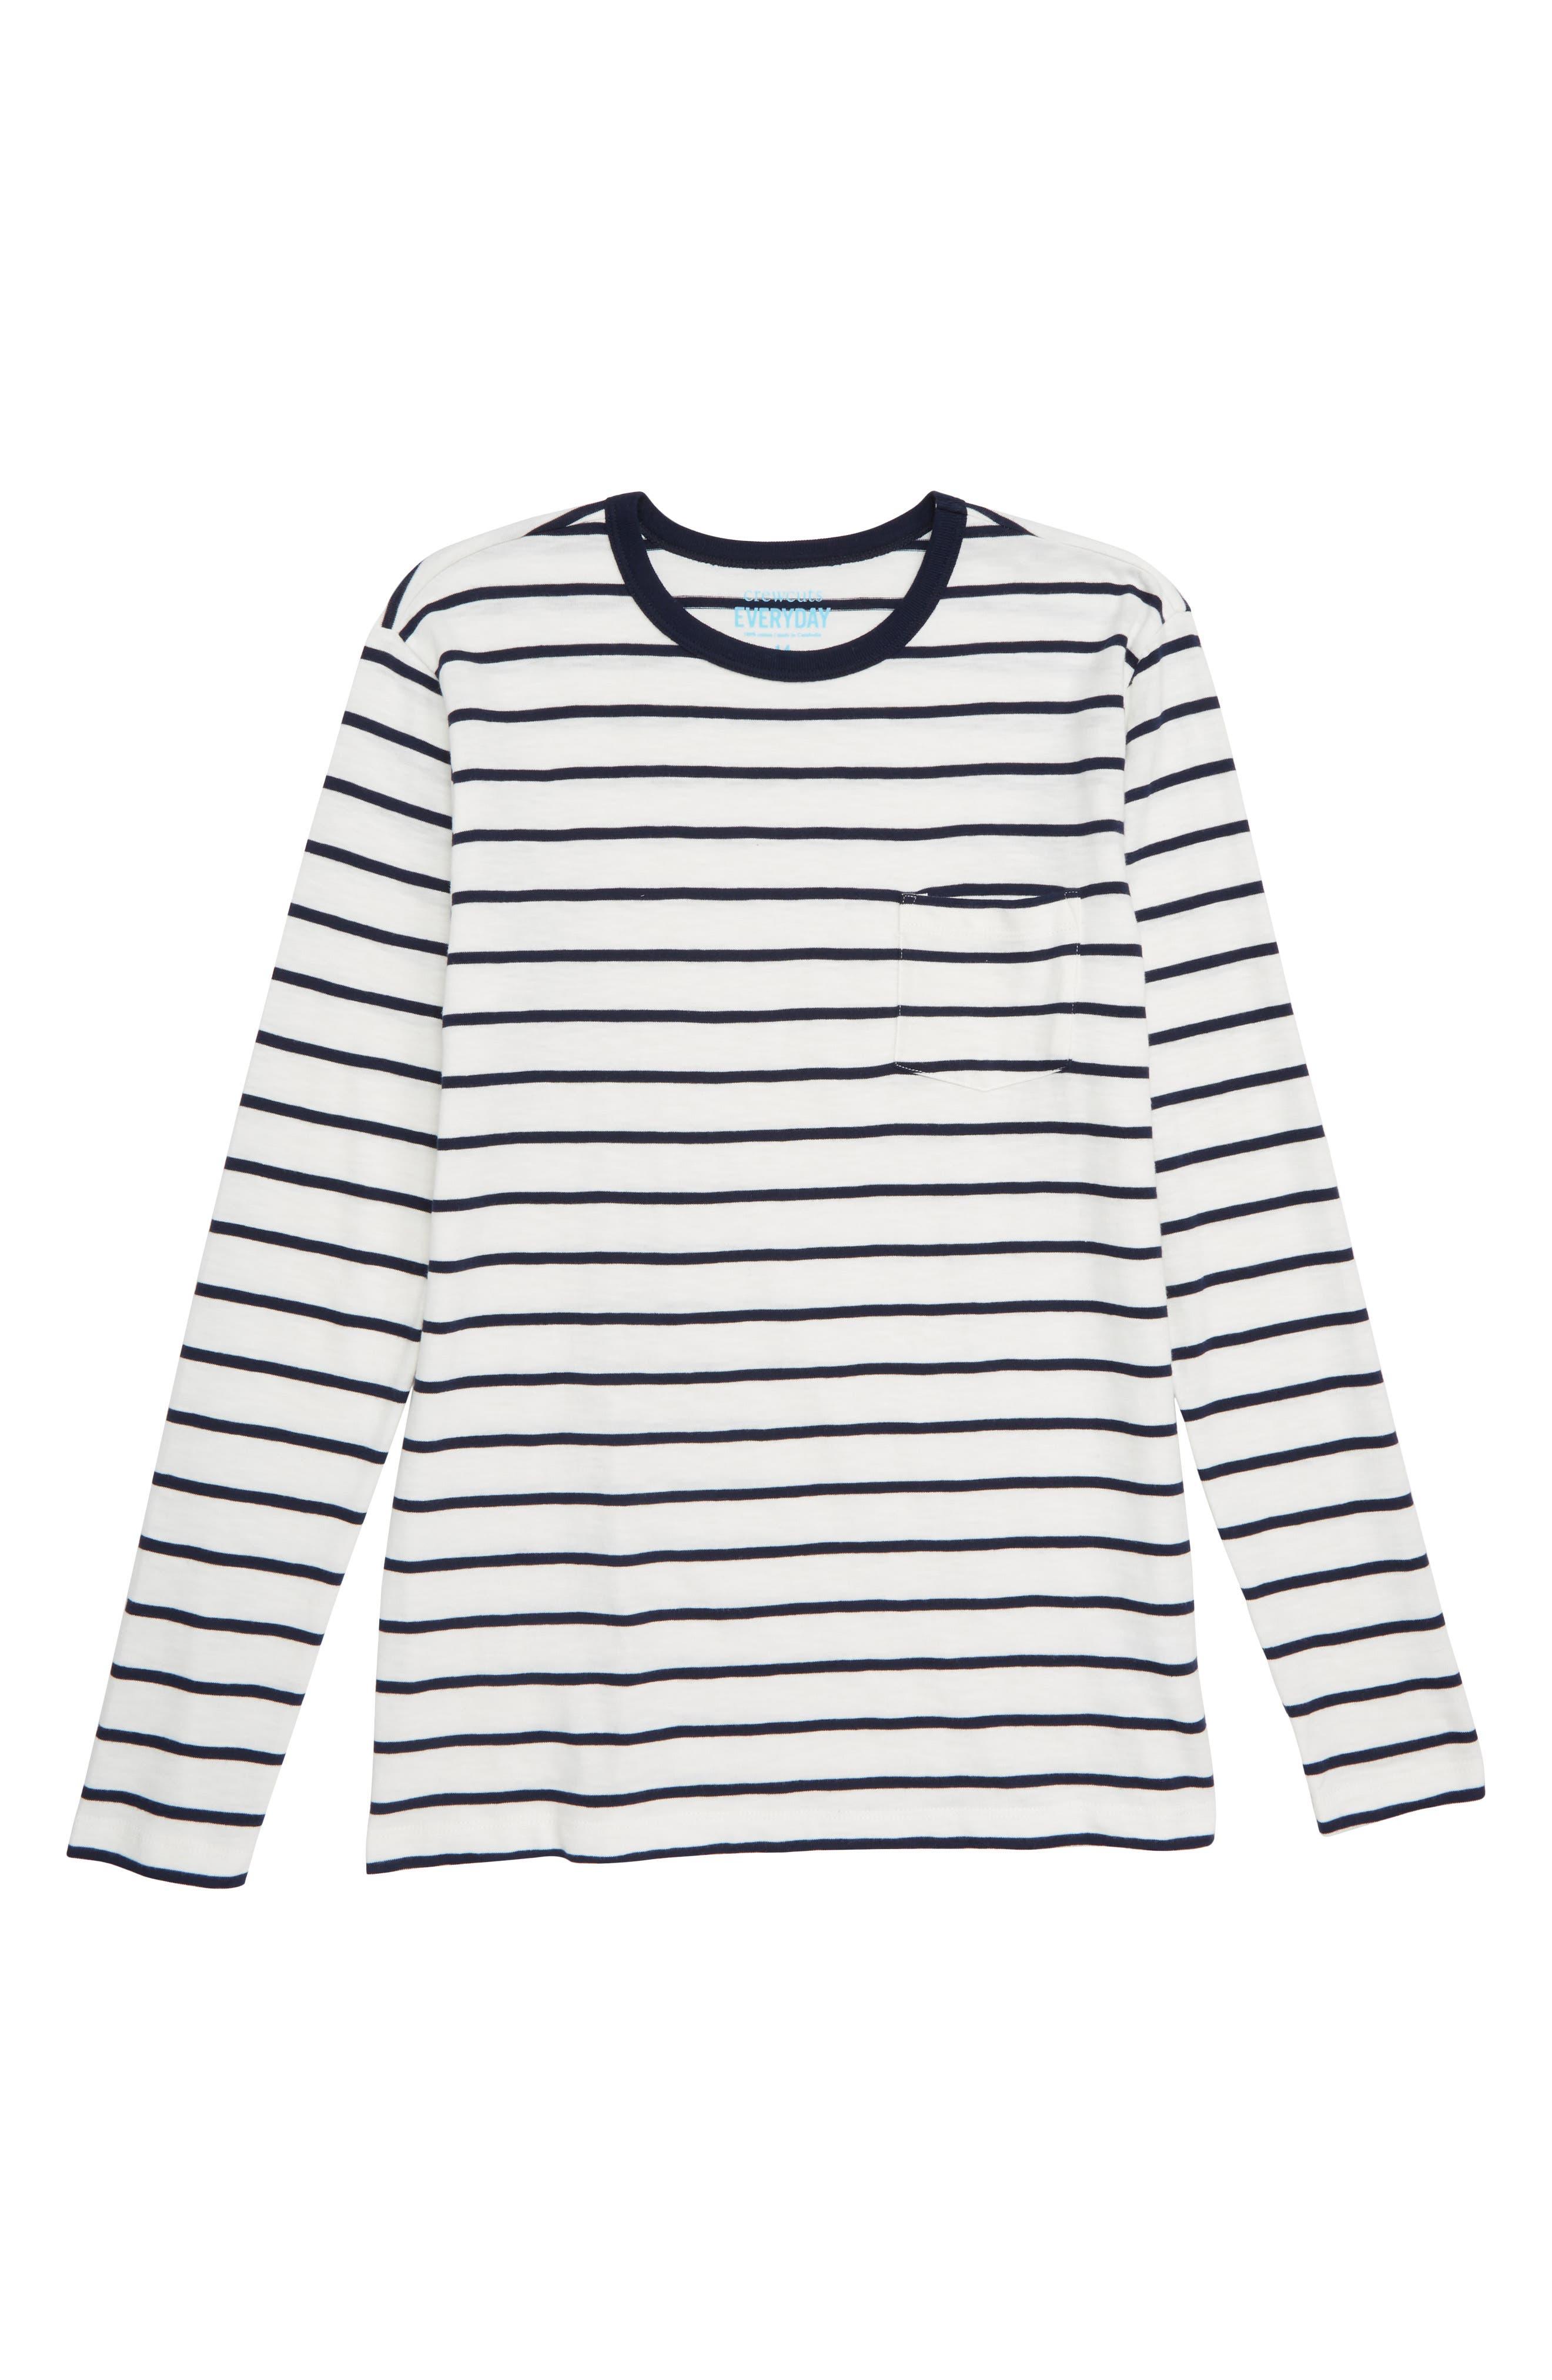 CREWCUTS BY J.CREW,                             Stripe Slub Cotton T-Shirt,                             Main thumbnail 1, color,                             900